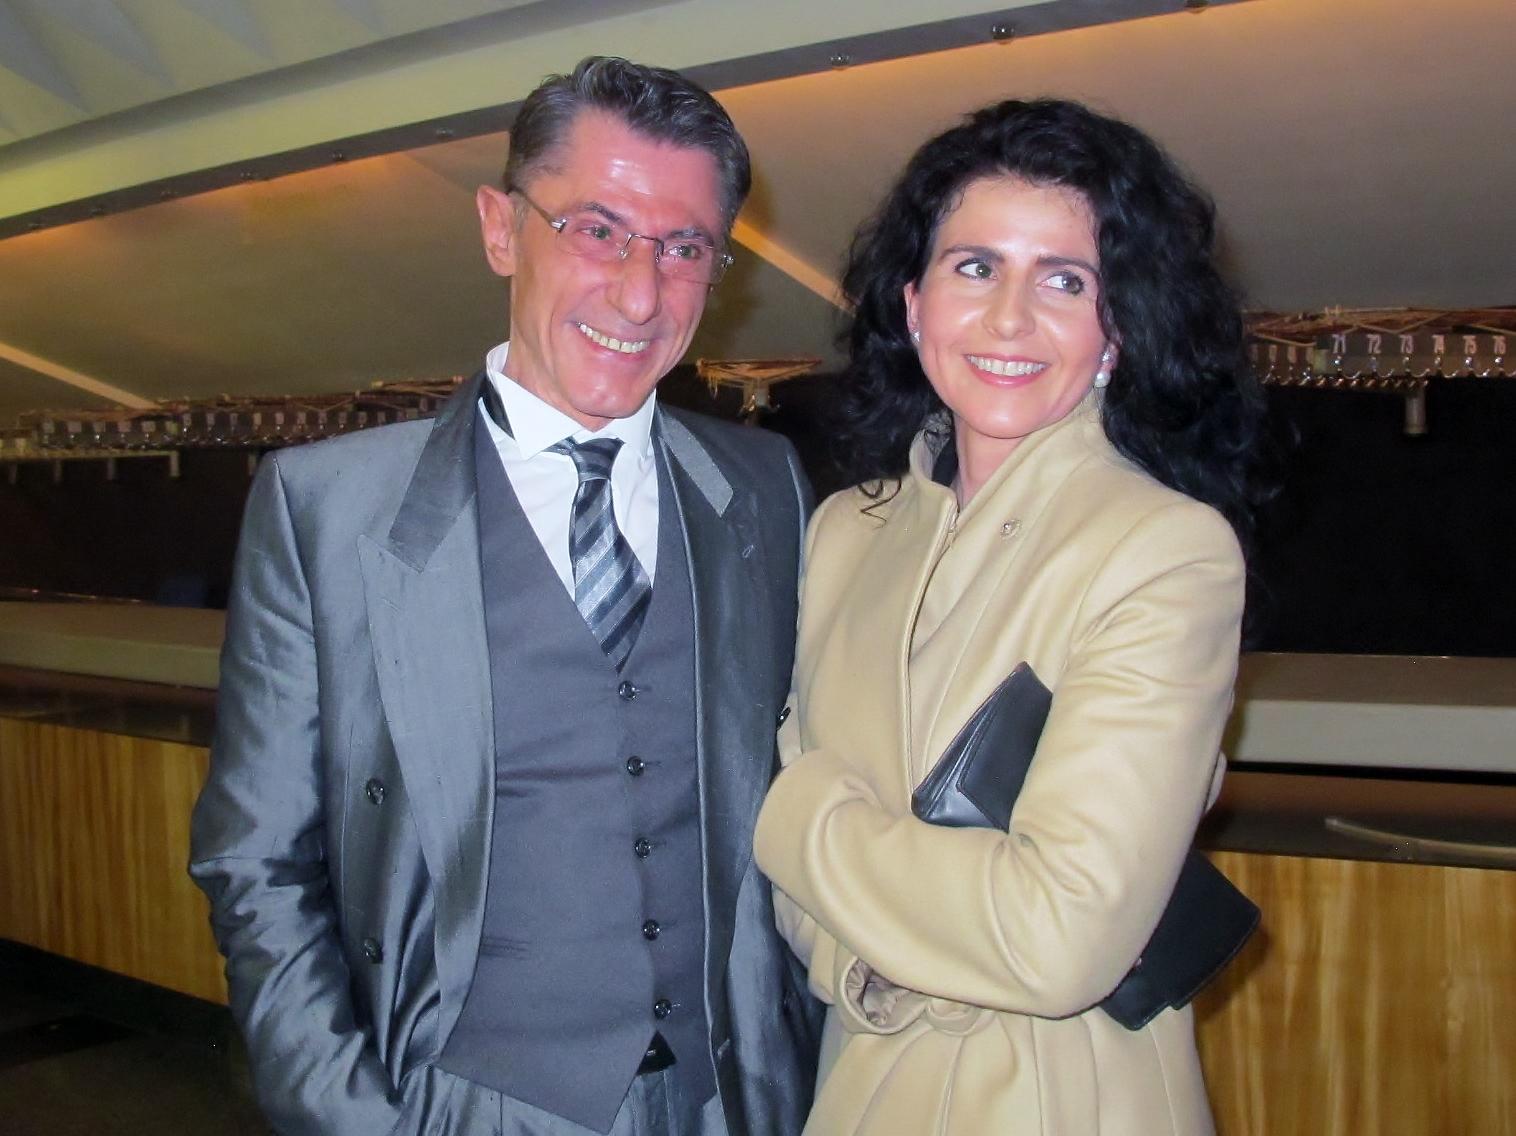 Jean Carlo Dernie and Jitka Opletalova at the Shen Yun performance at the Janacek Theatre in Brno, Czech Republic on March 26, 2016. (Mary Cann/Epoch Times)